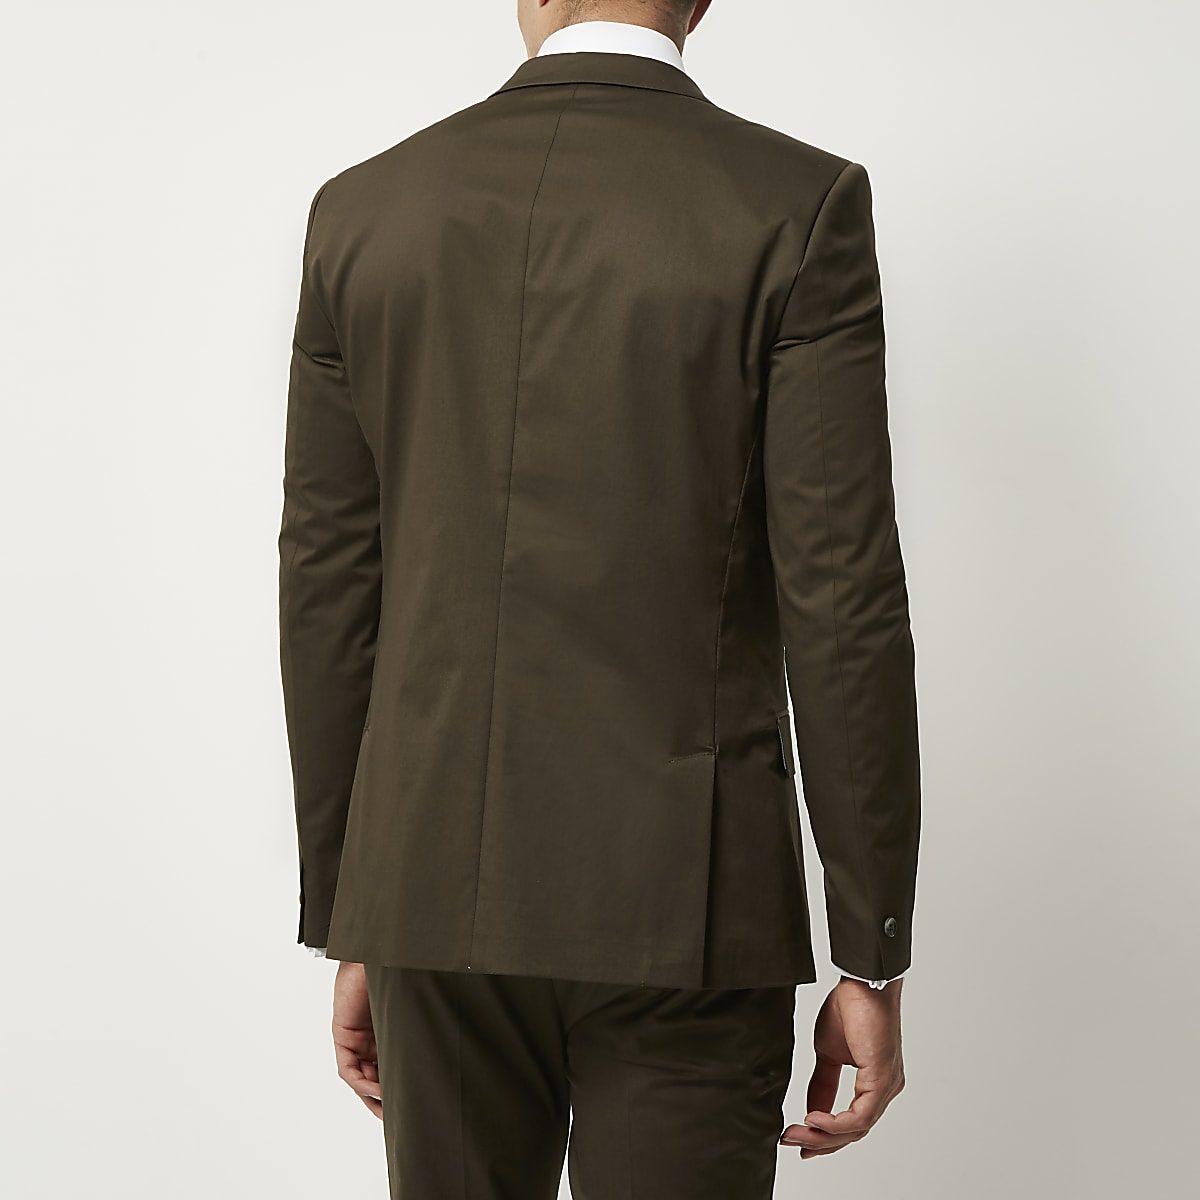 Dark Green Skinny Suit Jacket Suit Jackets Suits Men